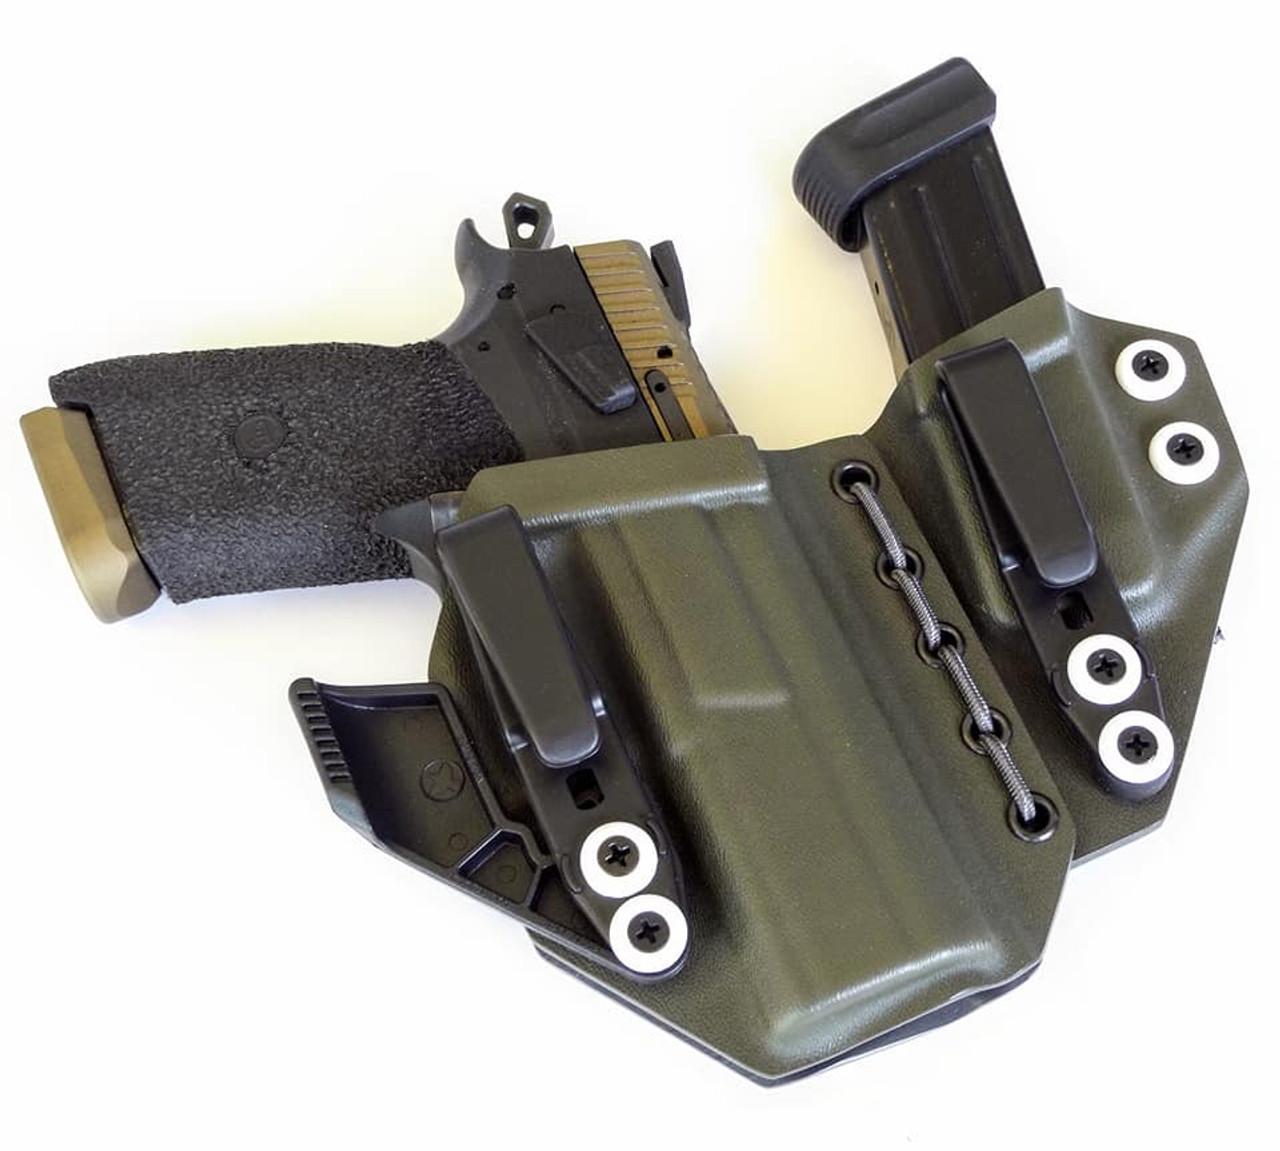 CZ P07 Flexible Appendix Carry Rig Holster